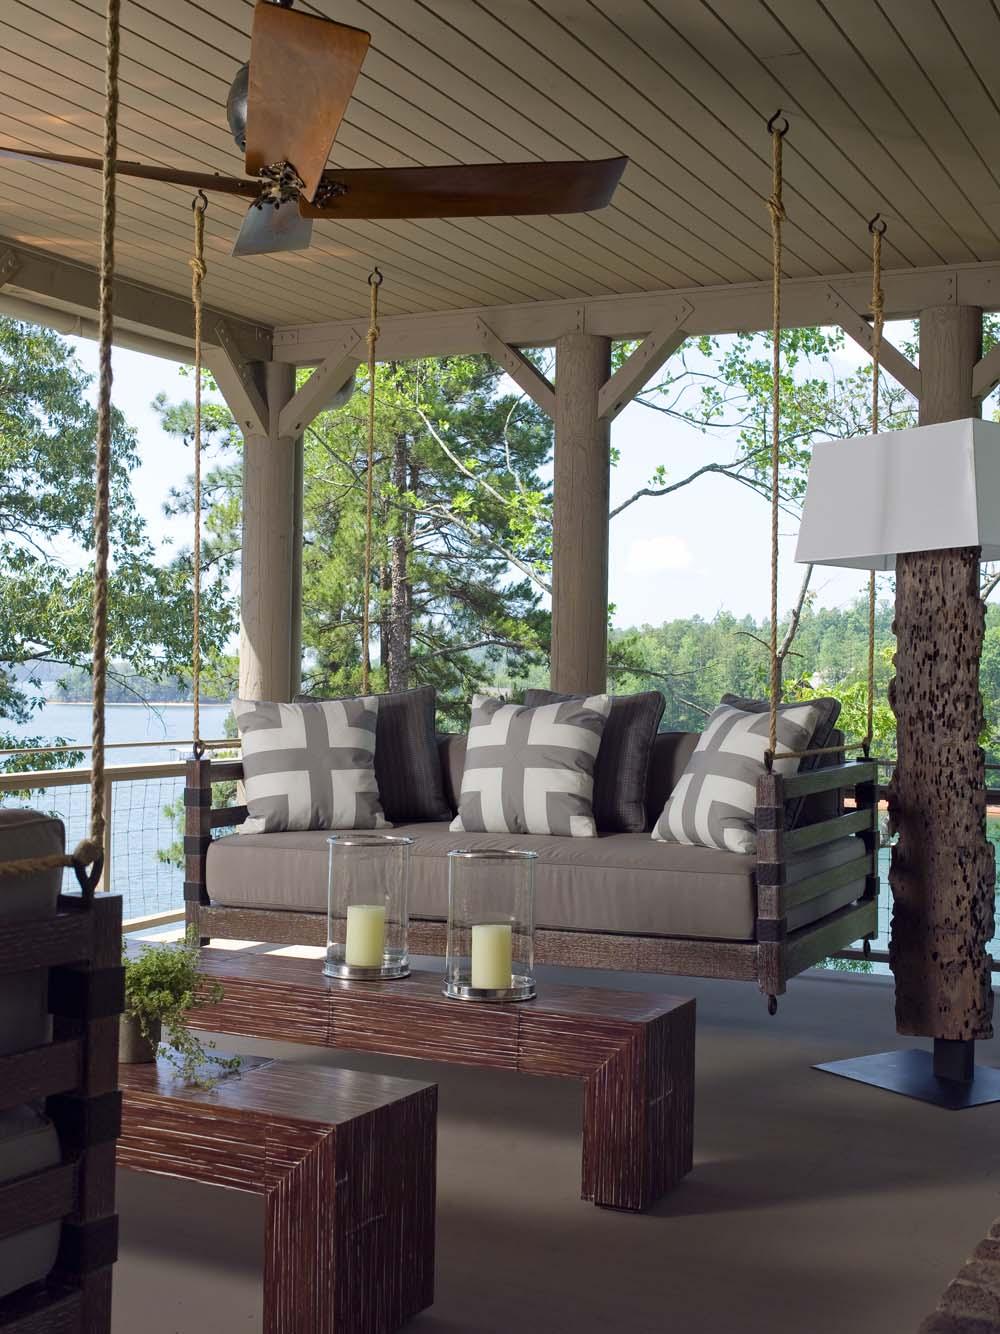 Webb Air Ventilator : Aesthetically thinking a breath of fresh air aria